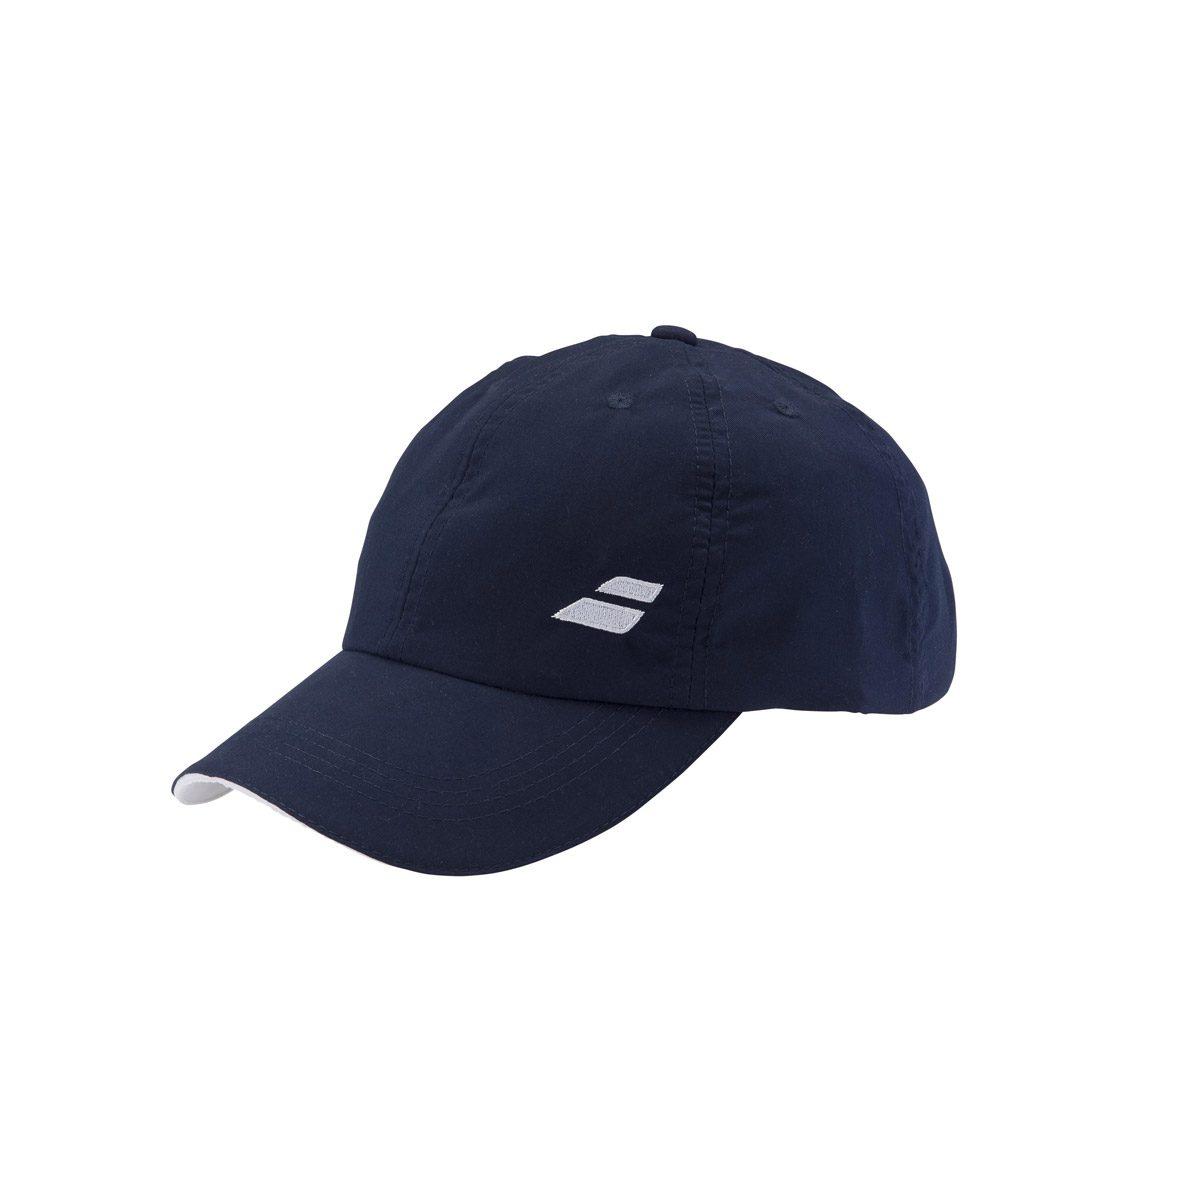 Babolat Basic Logo Men s Cap - Navy - Peake Performance Sports 794e16195b2a